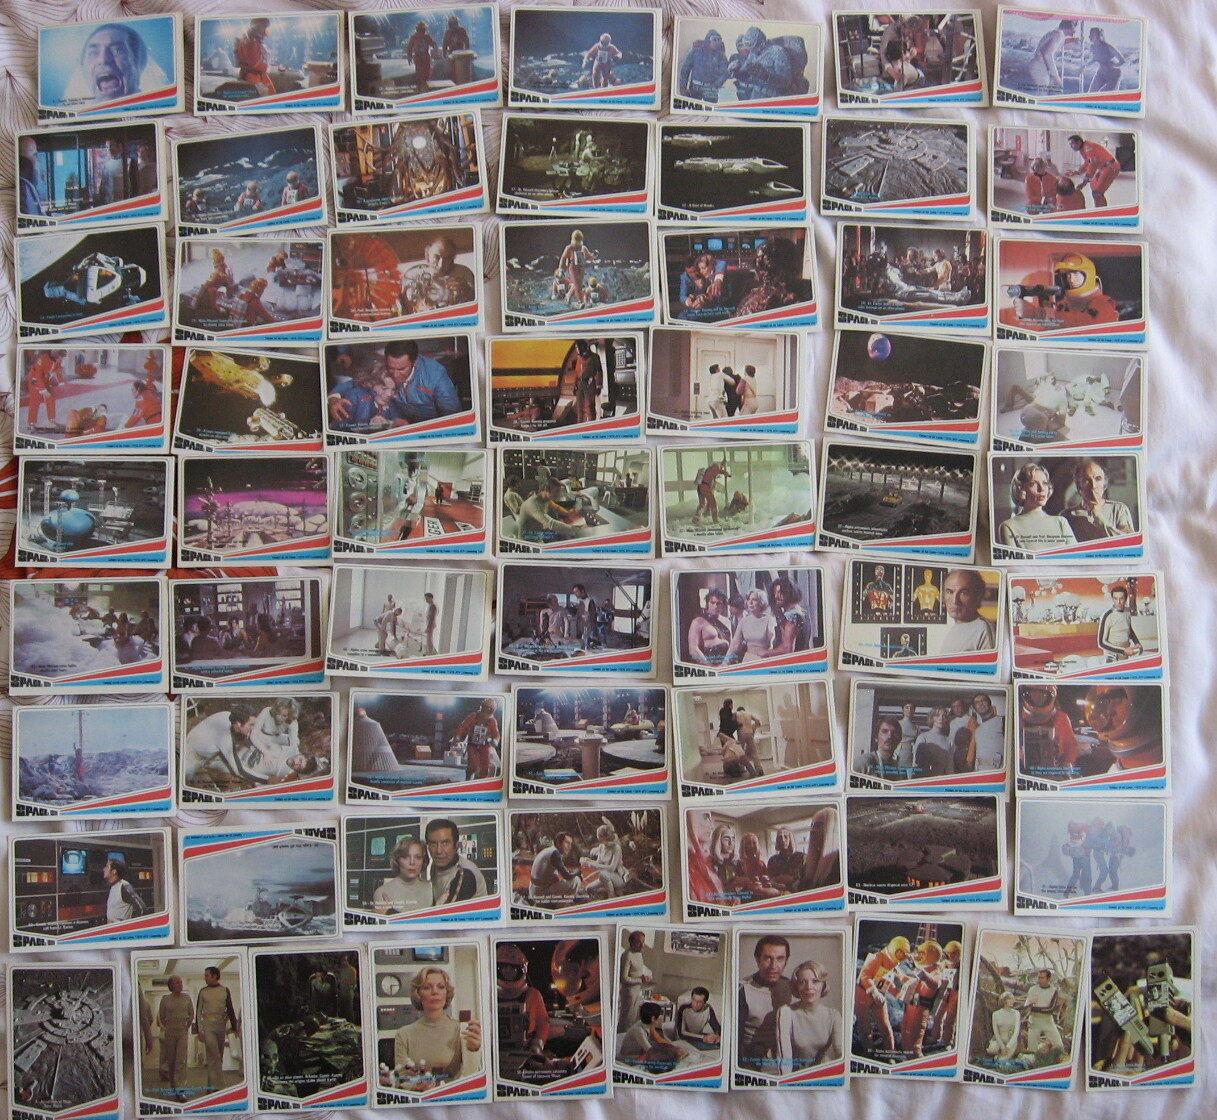 Eine serie de carte bolle 1999 kaugummi sette usa 1976 gerry anderson